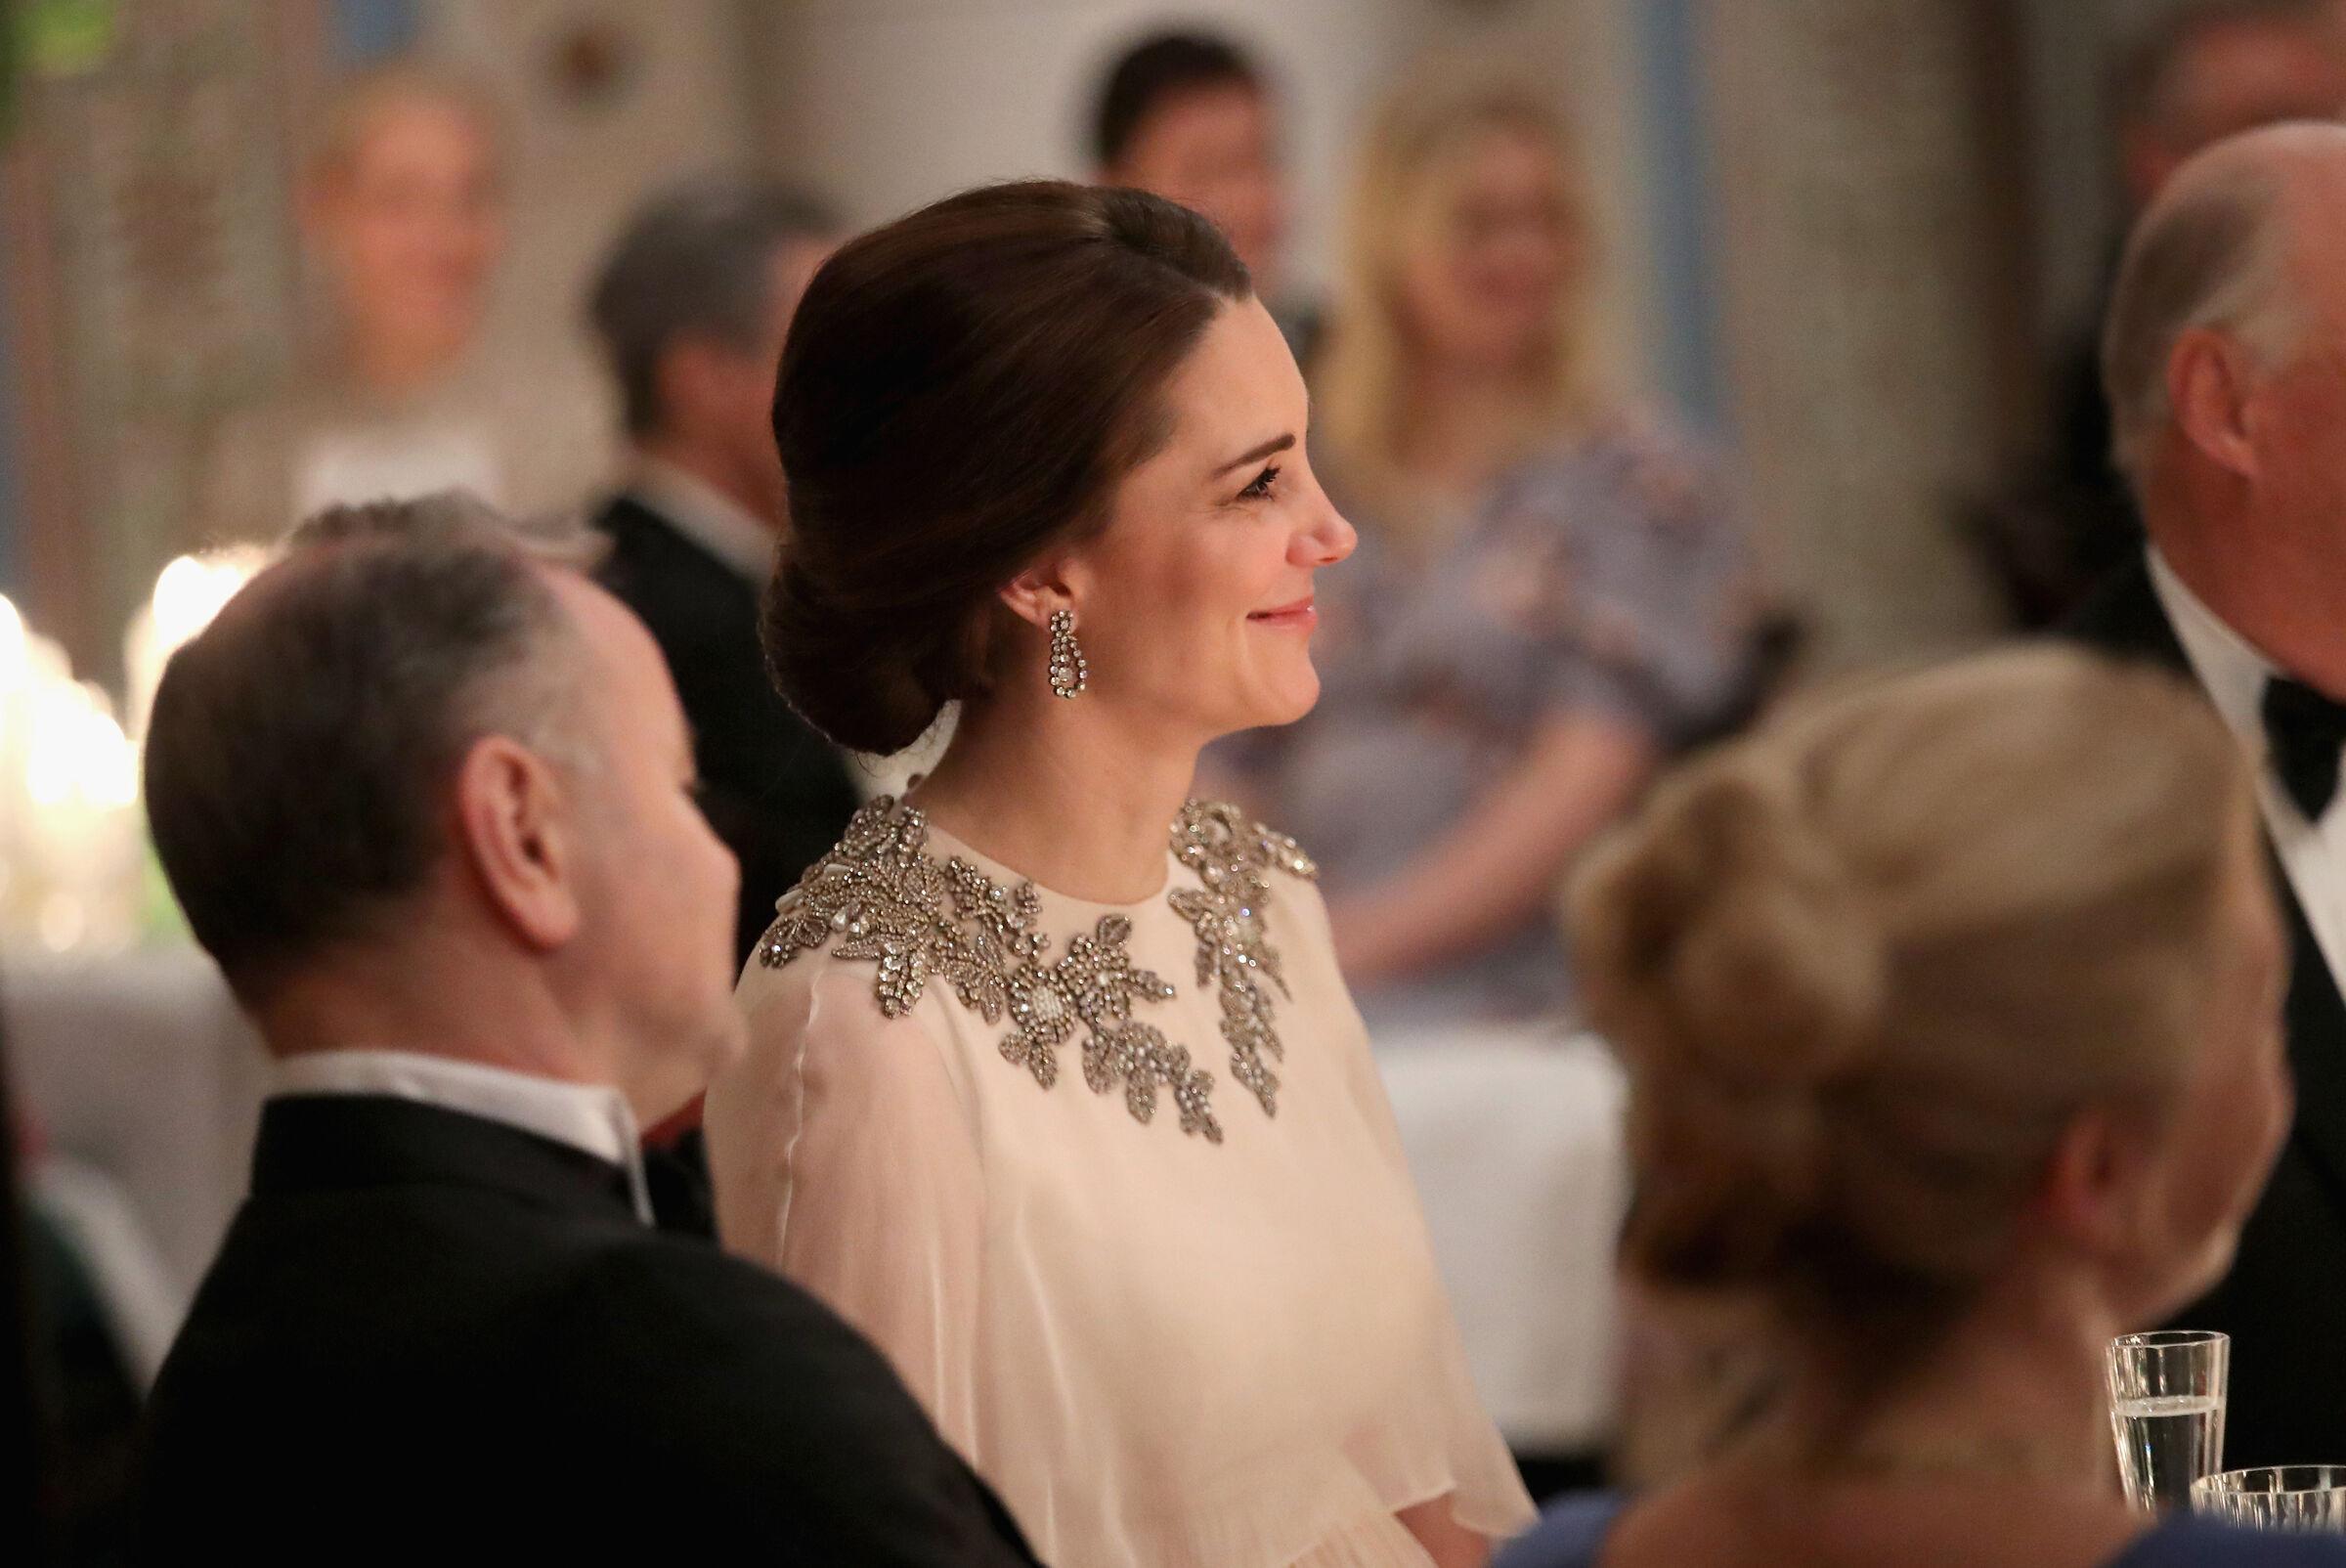 Kate Middleton marca a barriga da 3ª gravidez em vestido de gala